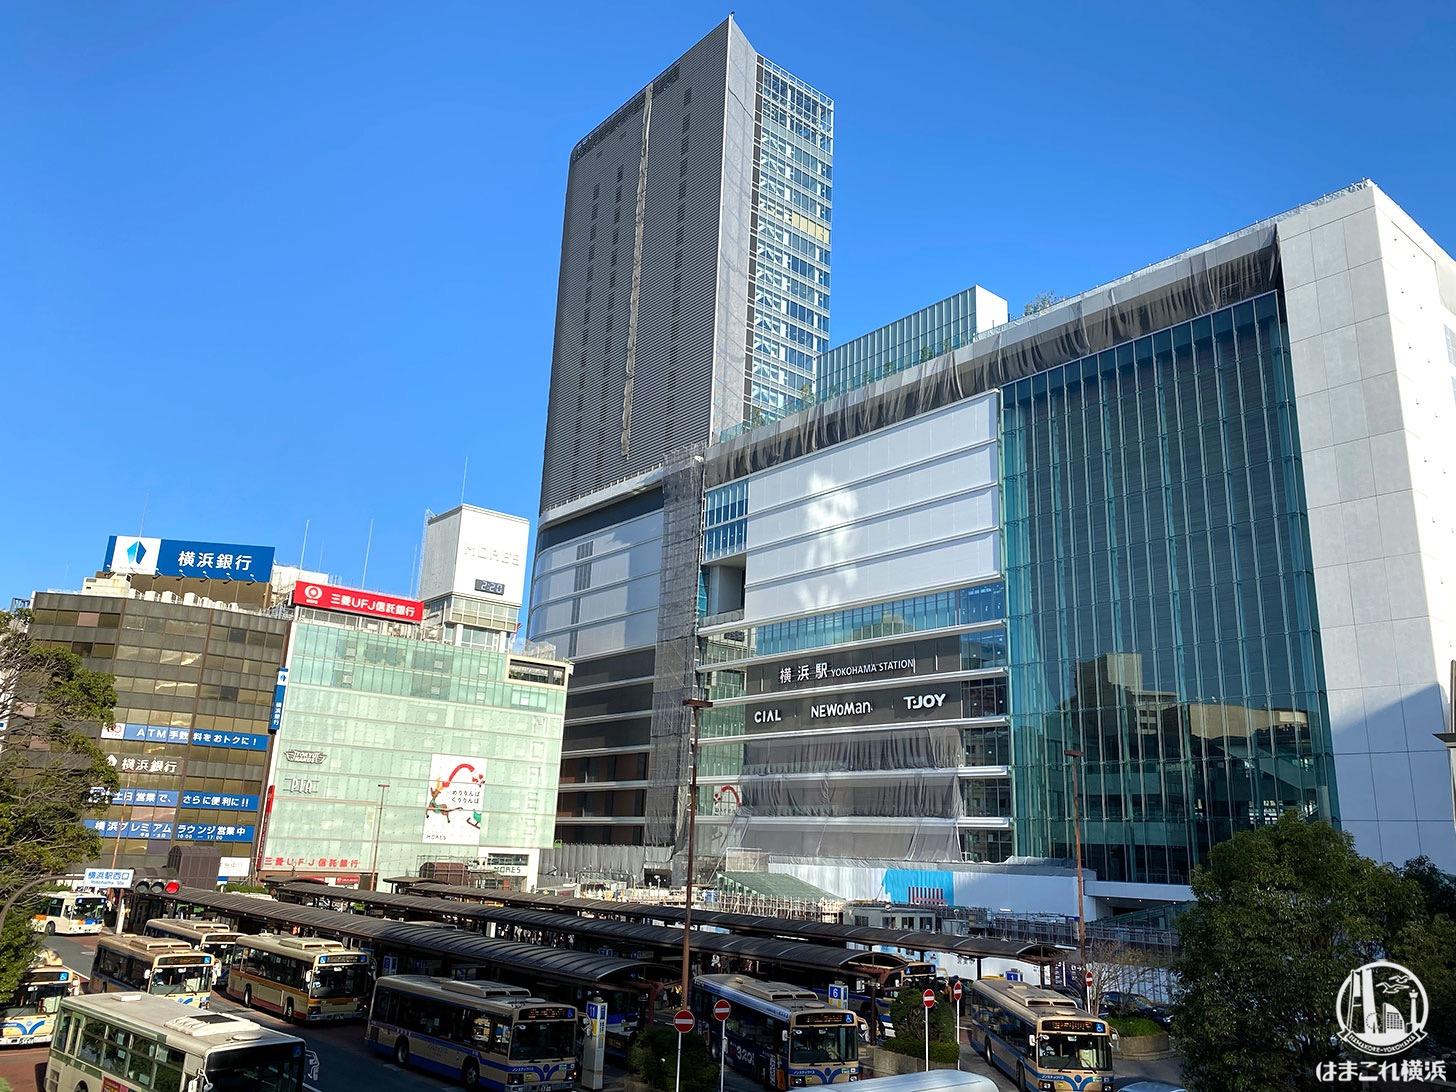 2019年11月 横浜駅西口の様子